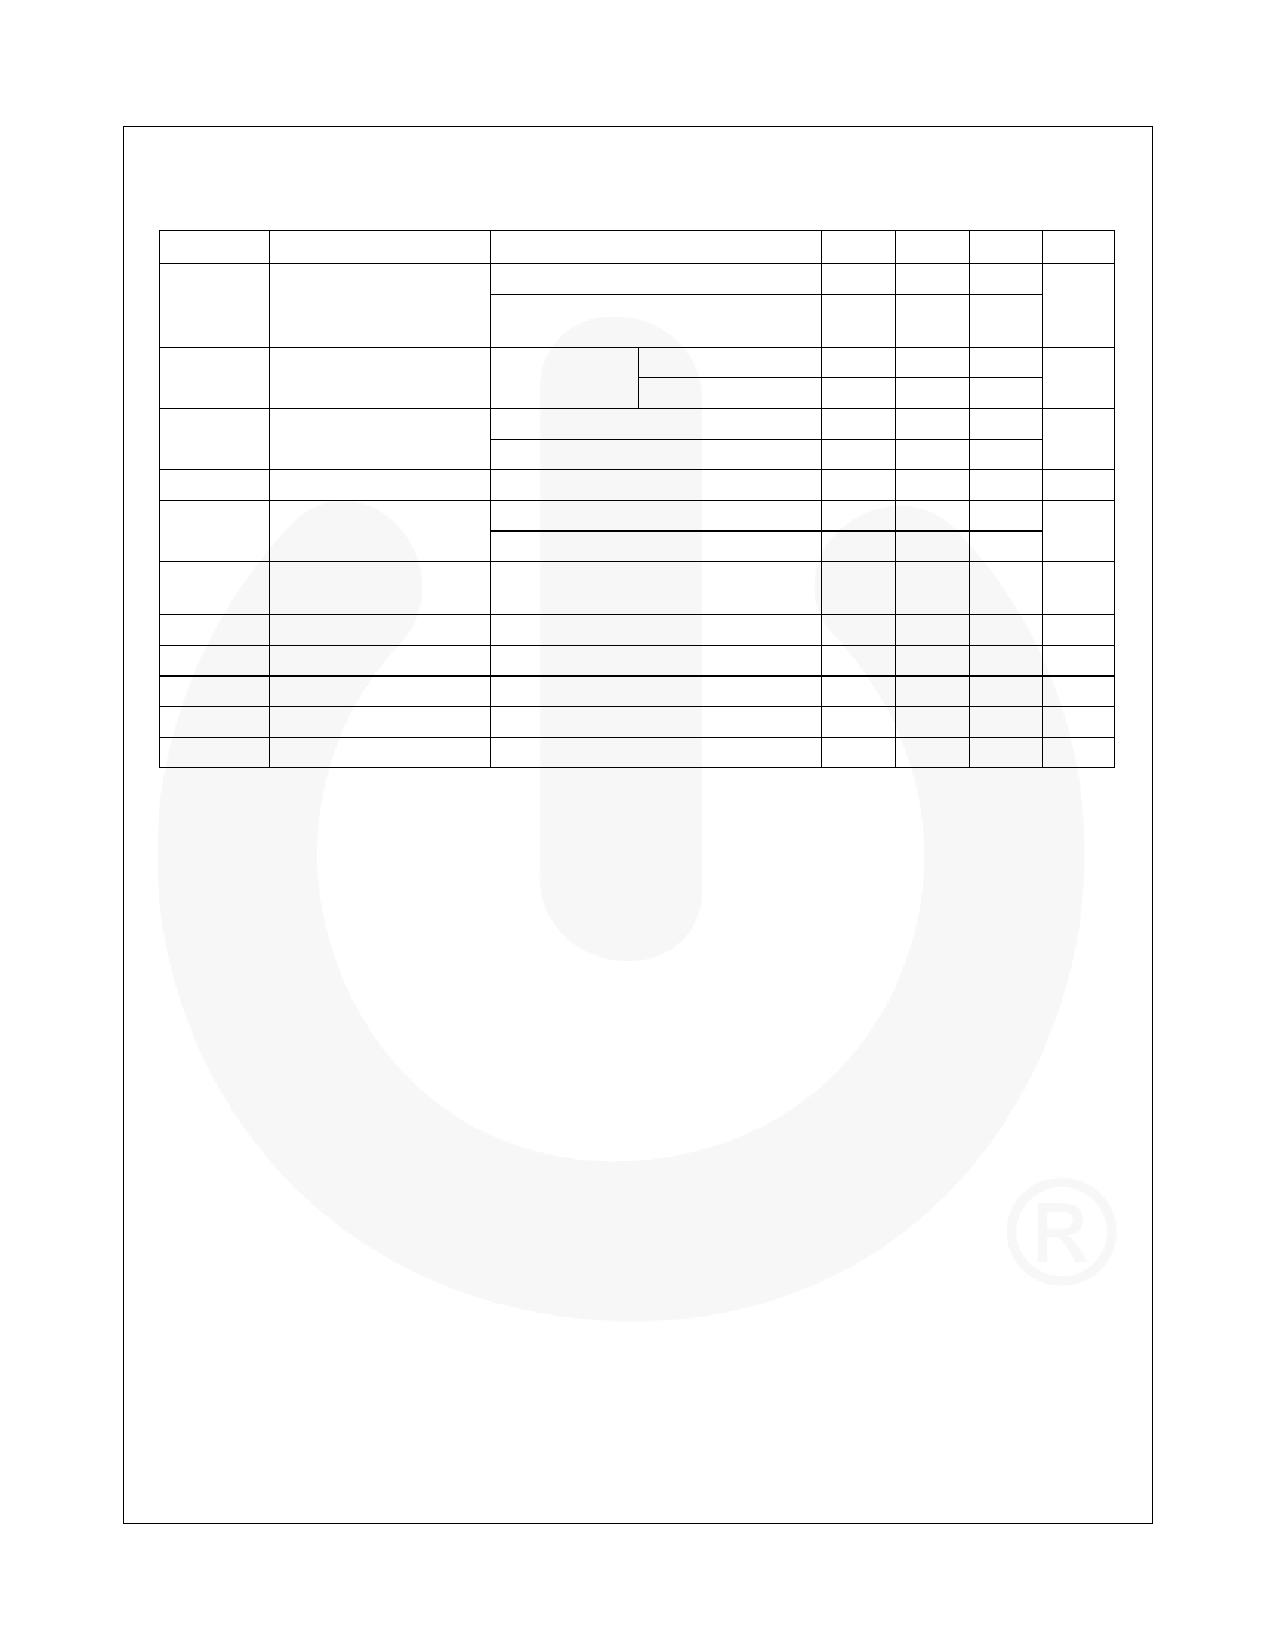 KA7908 pdf, ピン配列